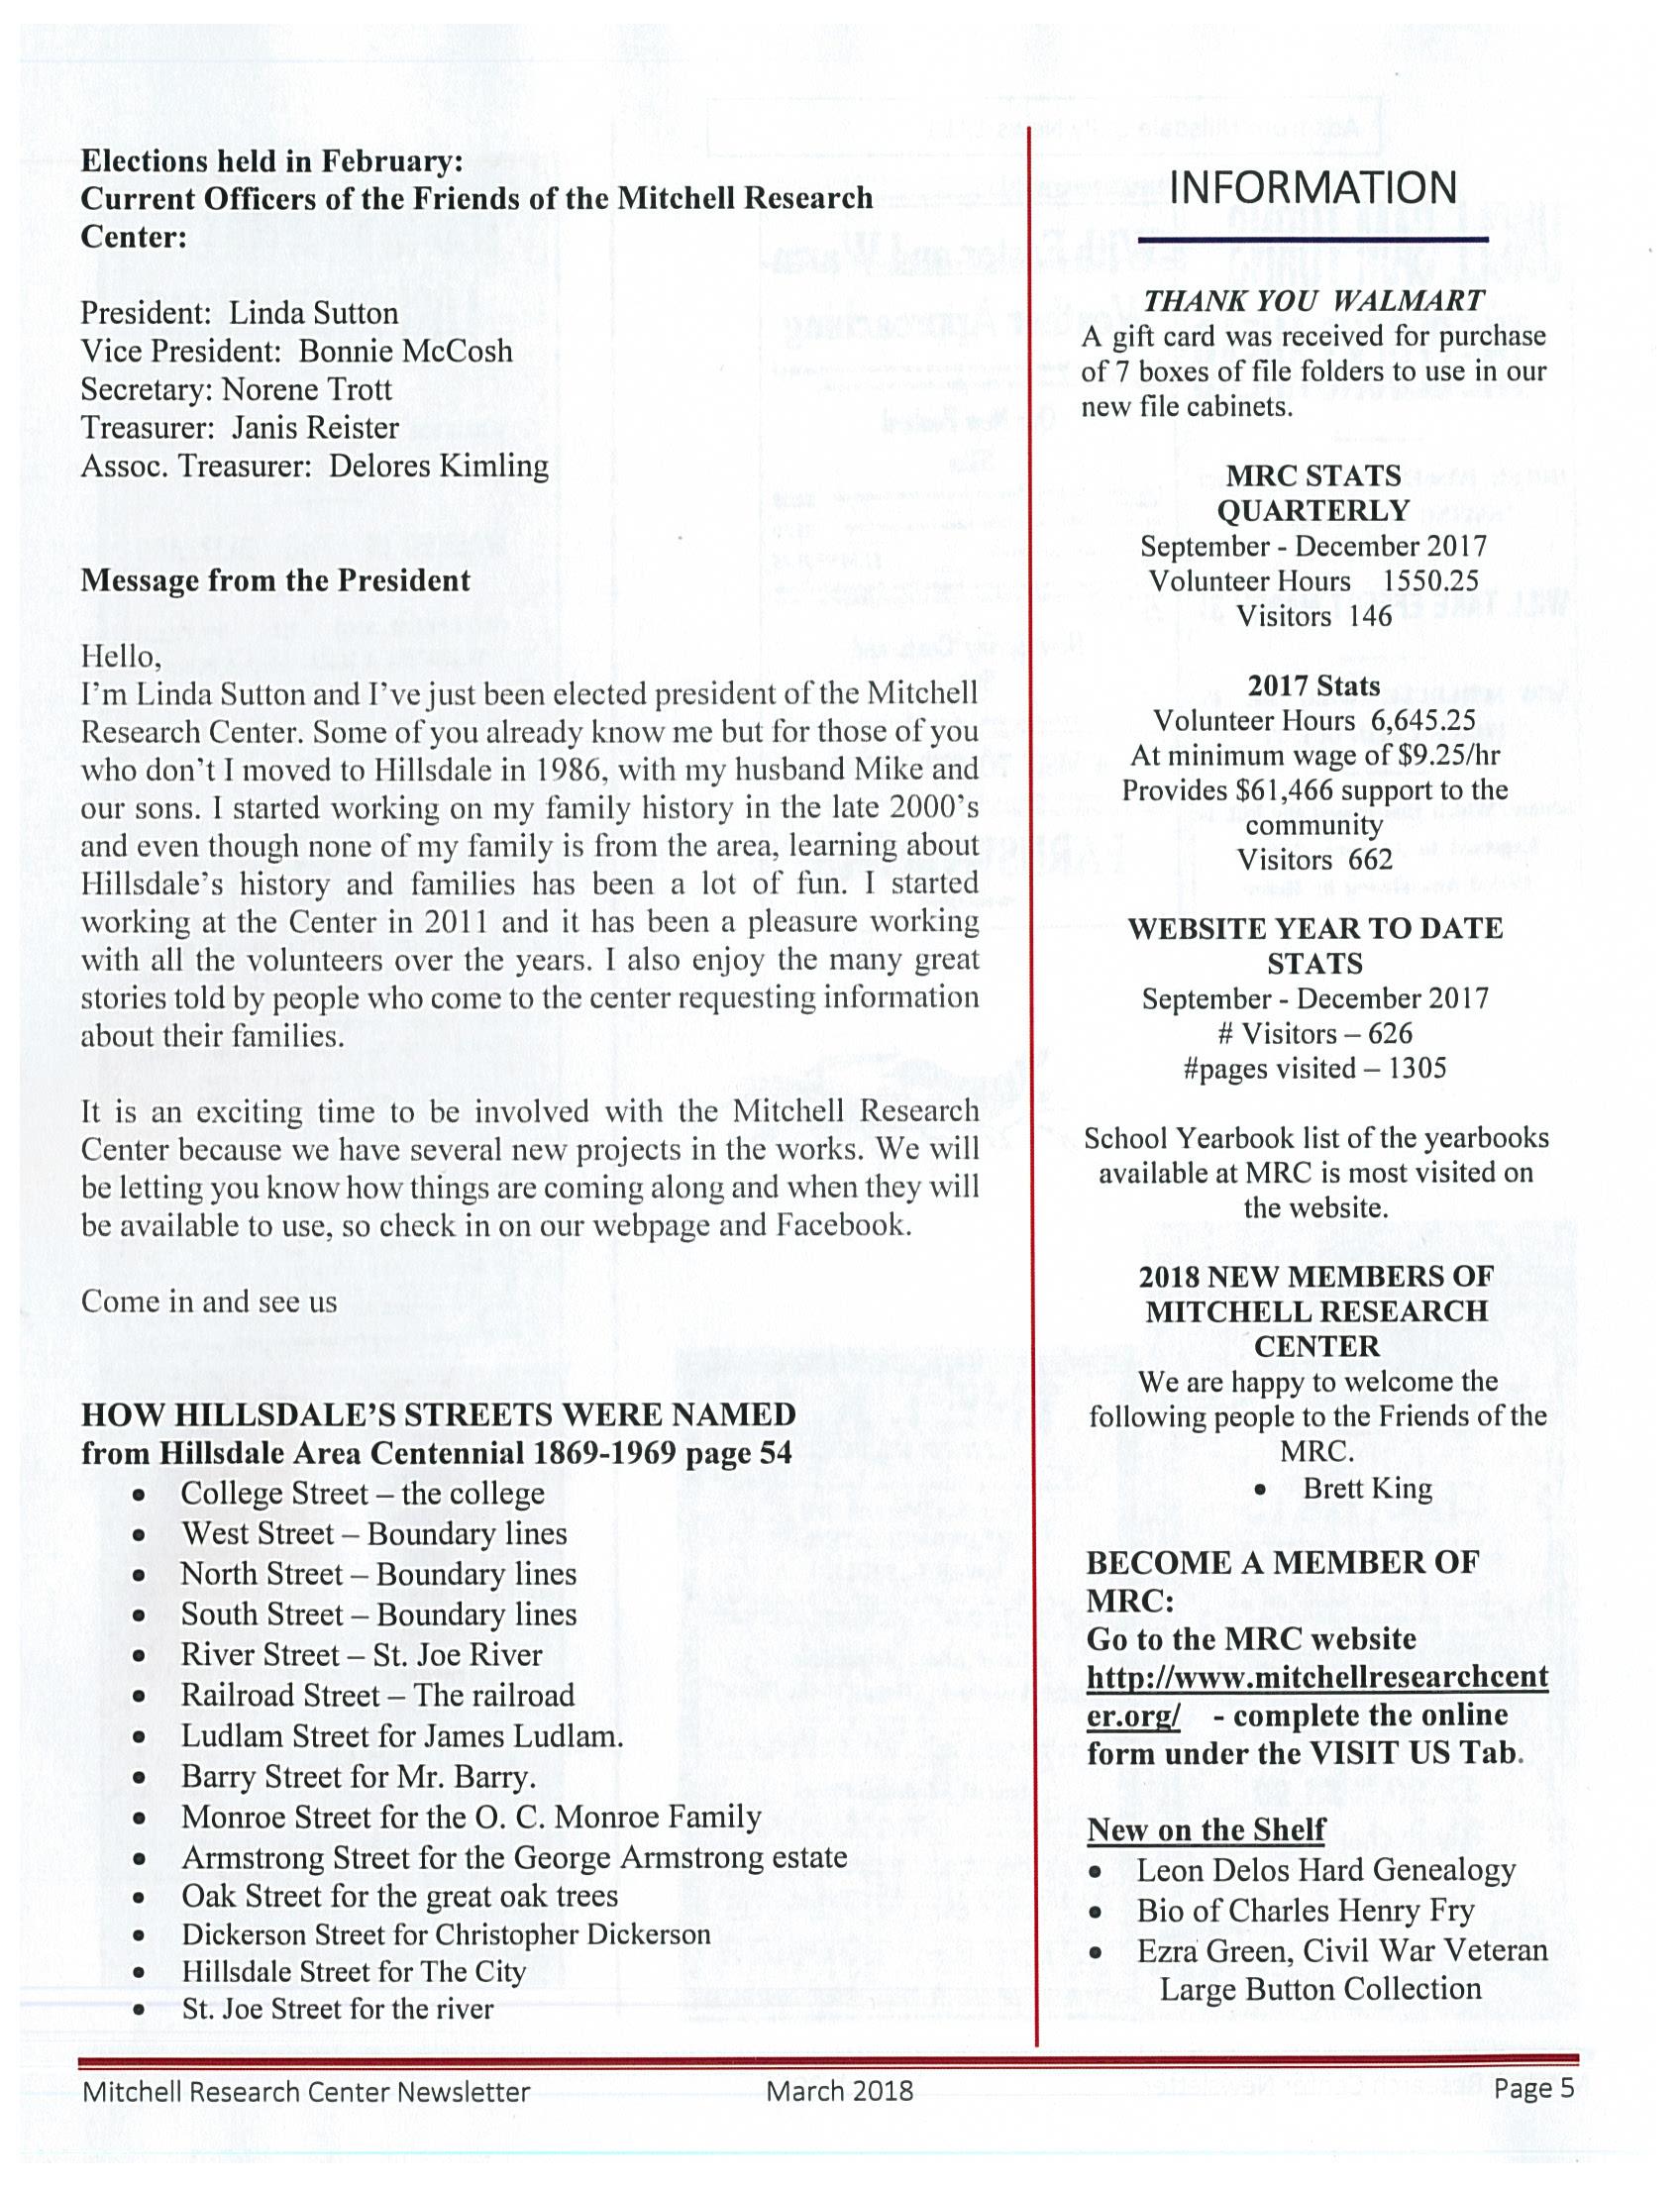 March 18 pg 5.jpg